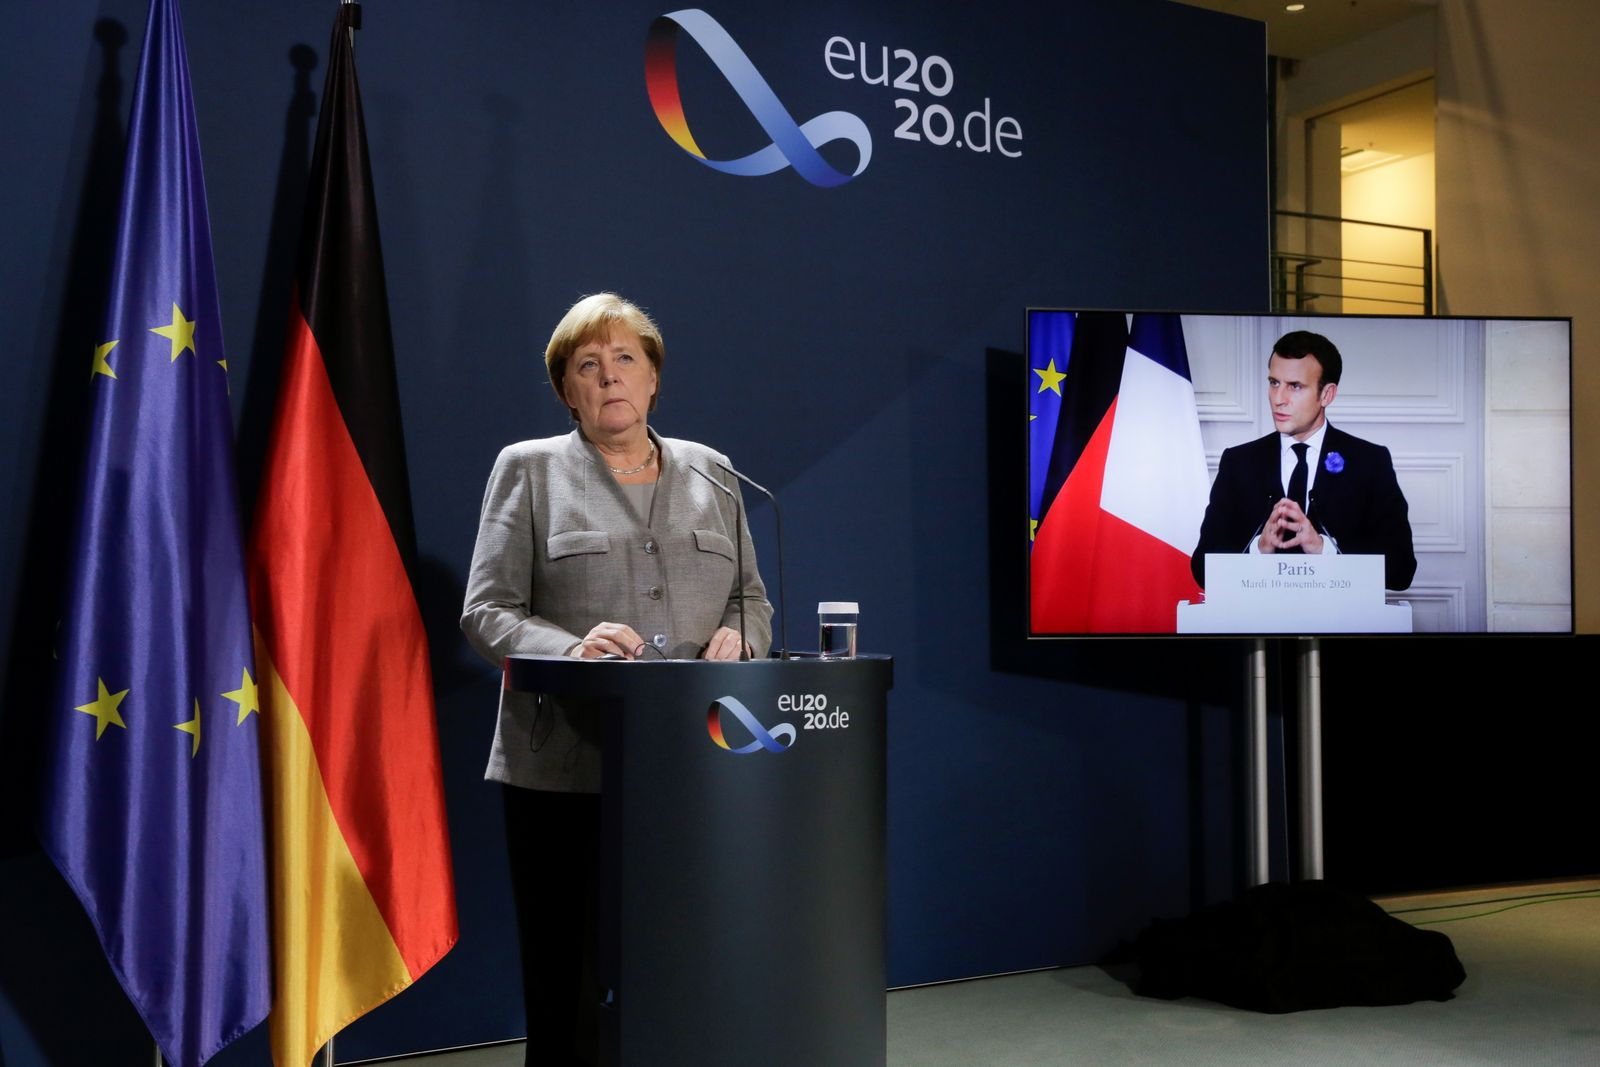 Germany's Merkel, France's Macron, Austria's Kurz discuss fight against Islamist extremism